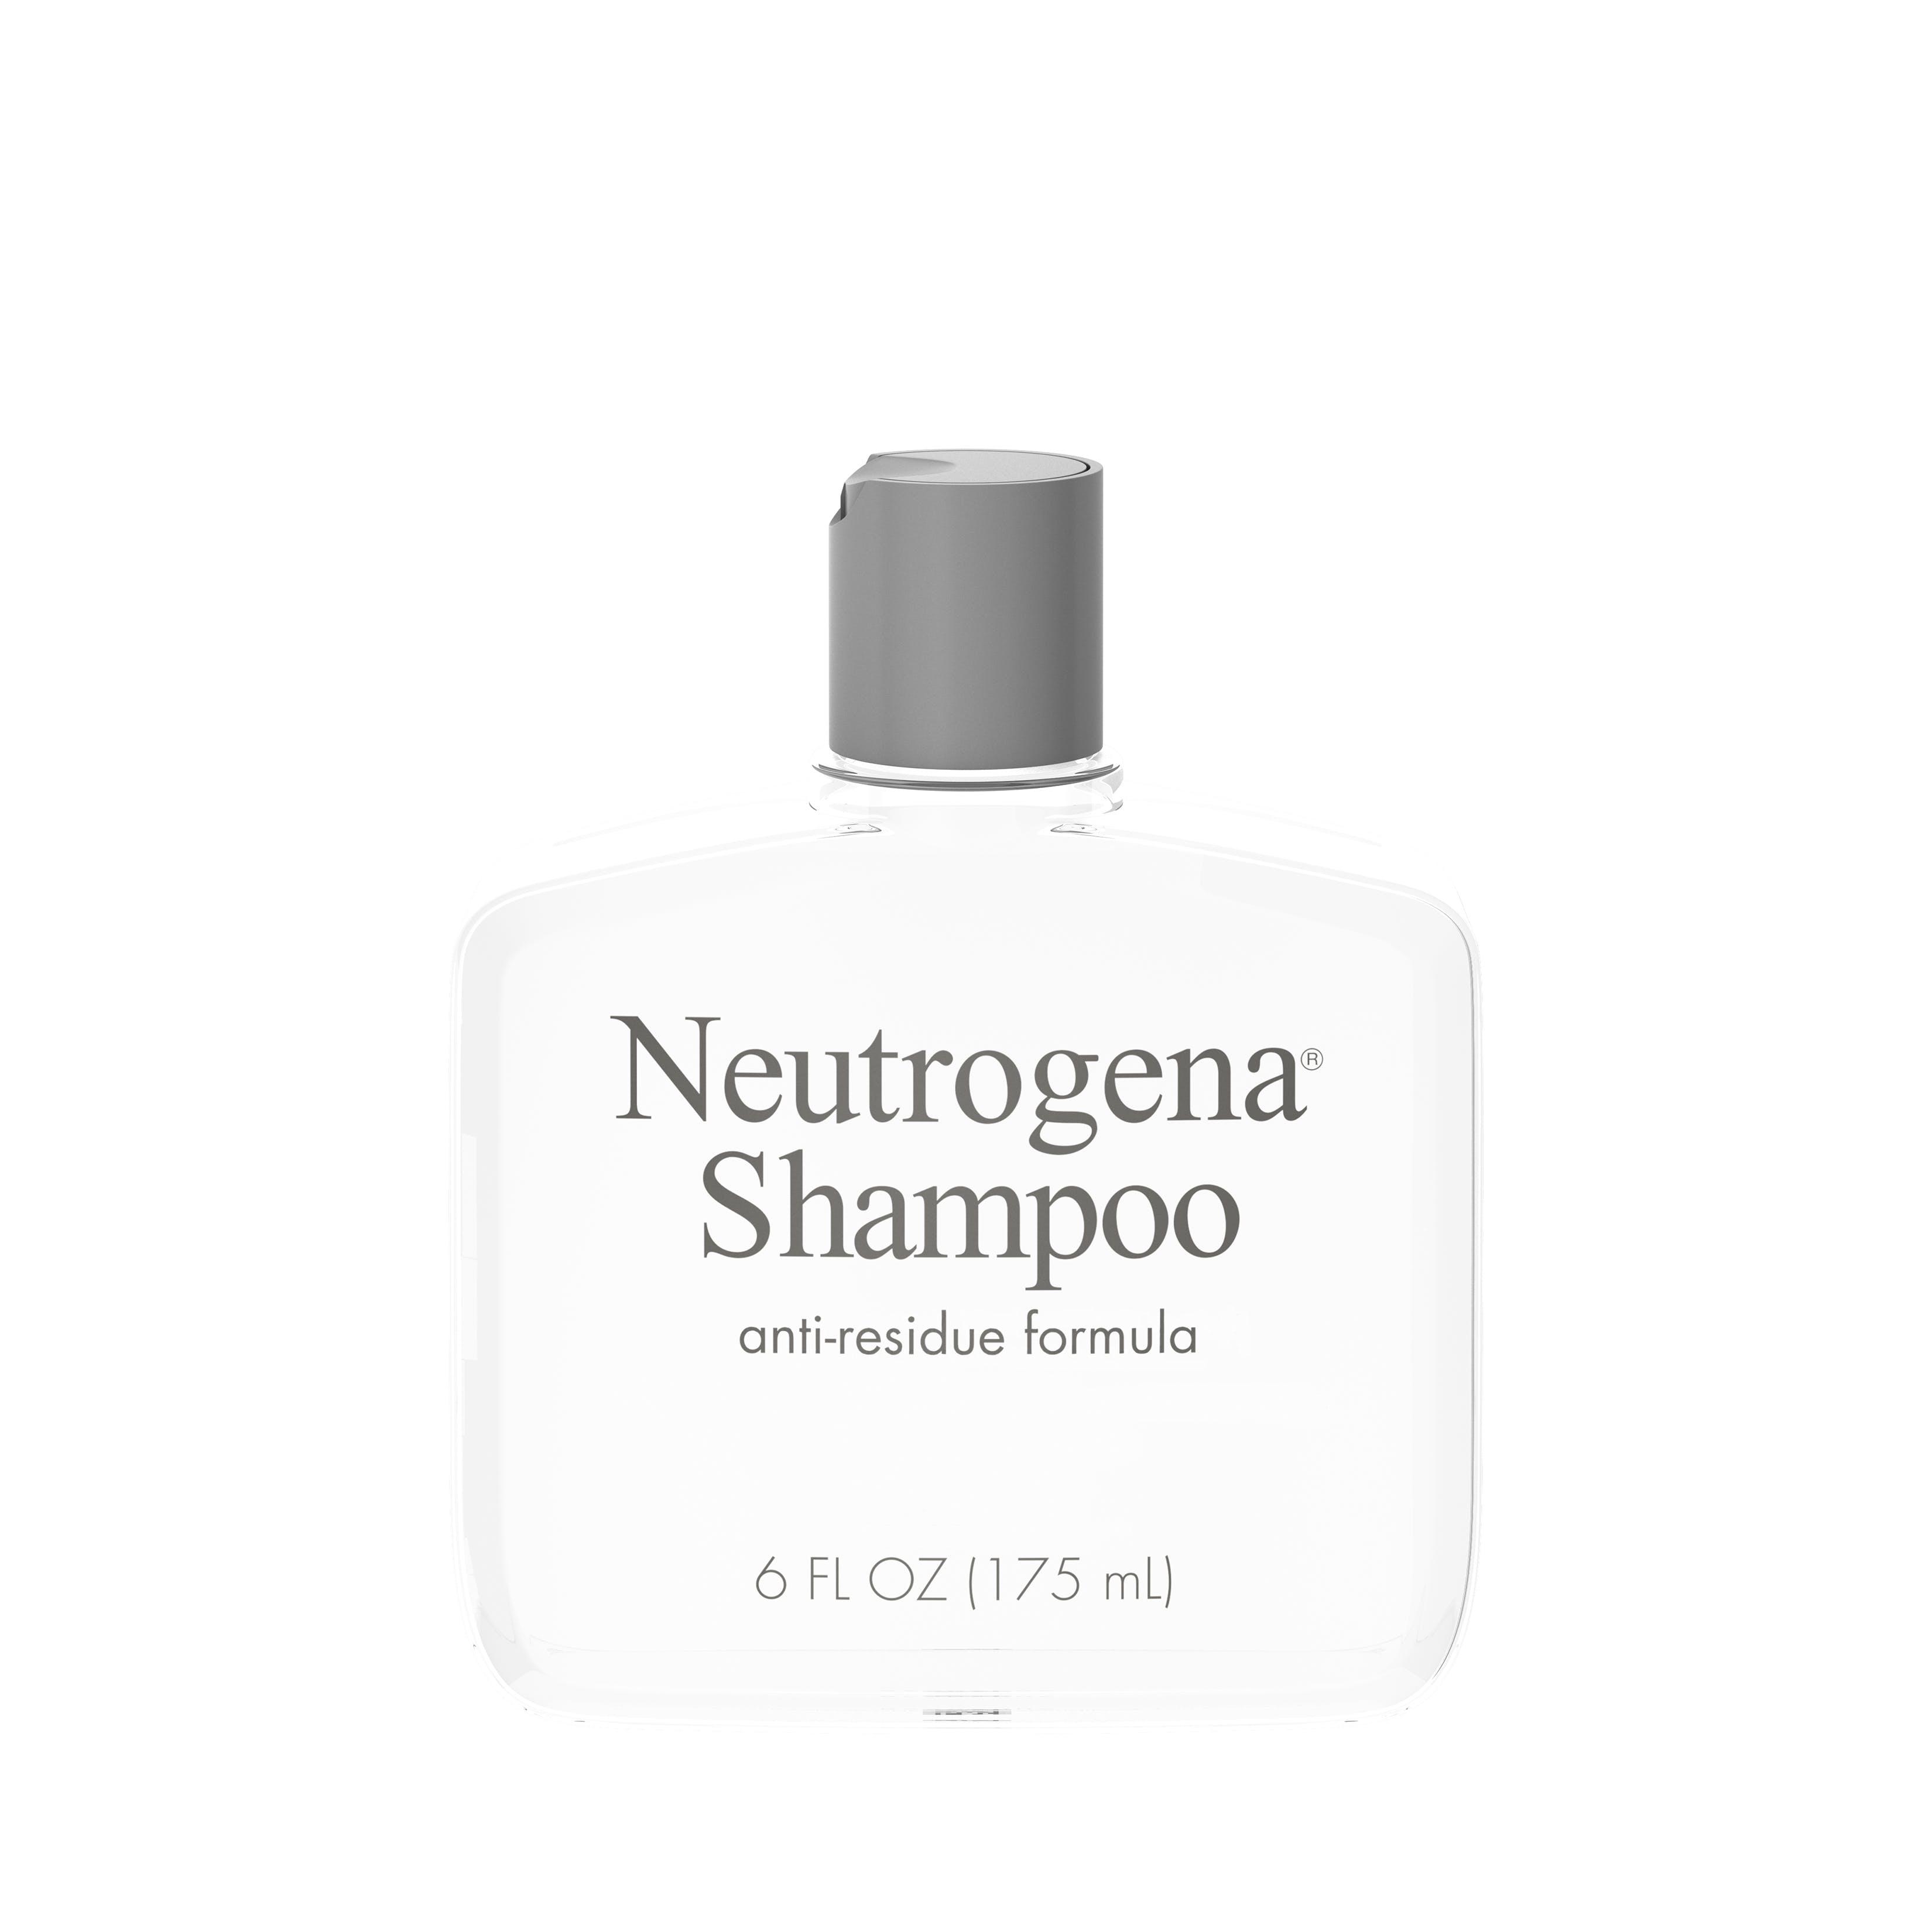 2. Neutrogena Anti-Residue Shampoo - Best Residue Removal Shampoo